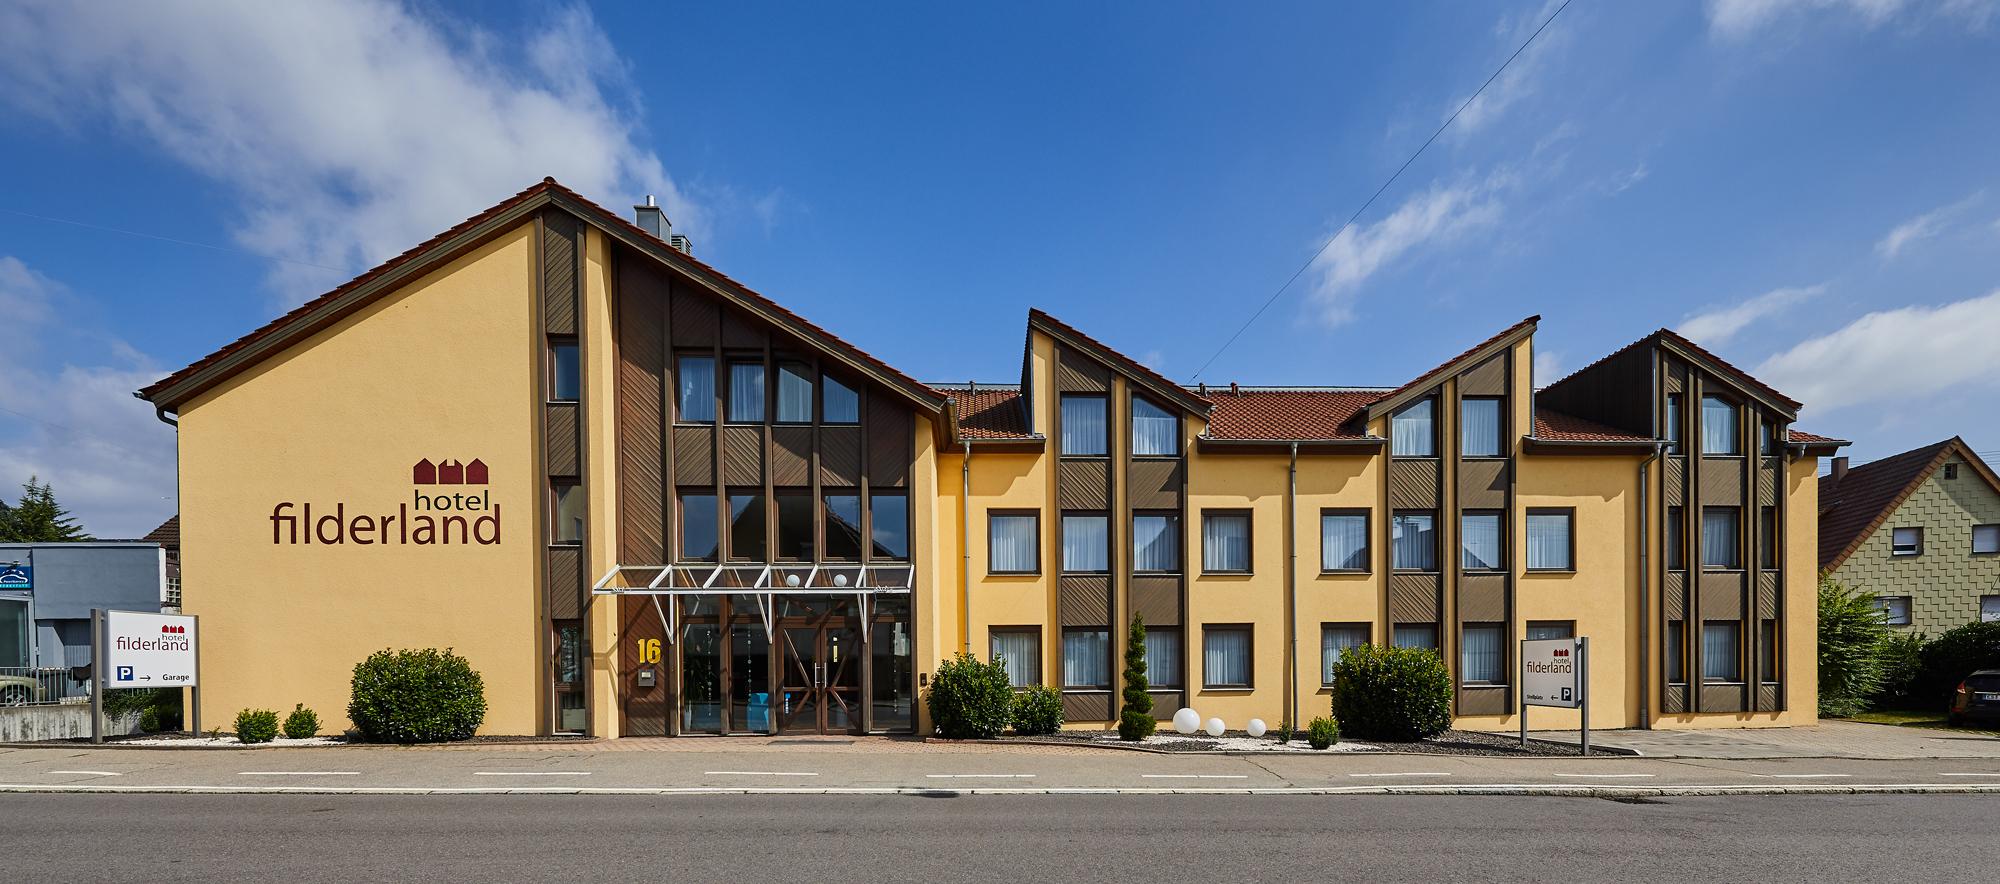 Frontansicht_Messehotel Airport-Hotel StuttgartHotel Filderland Leinfelden Echterdingen